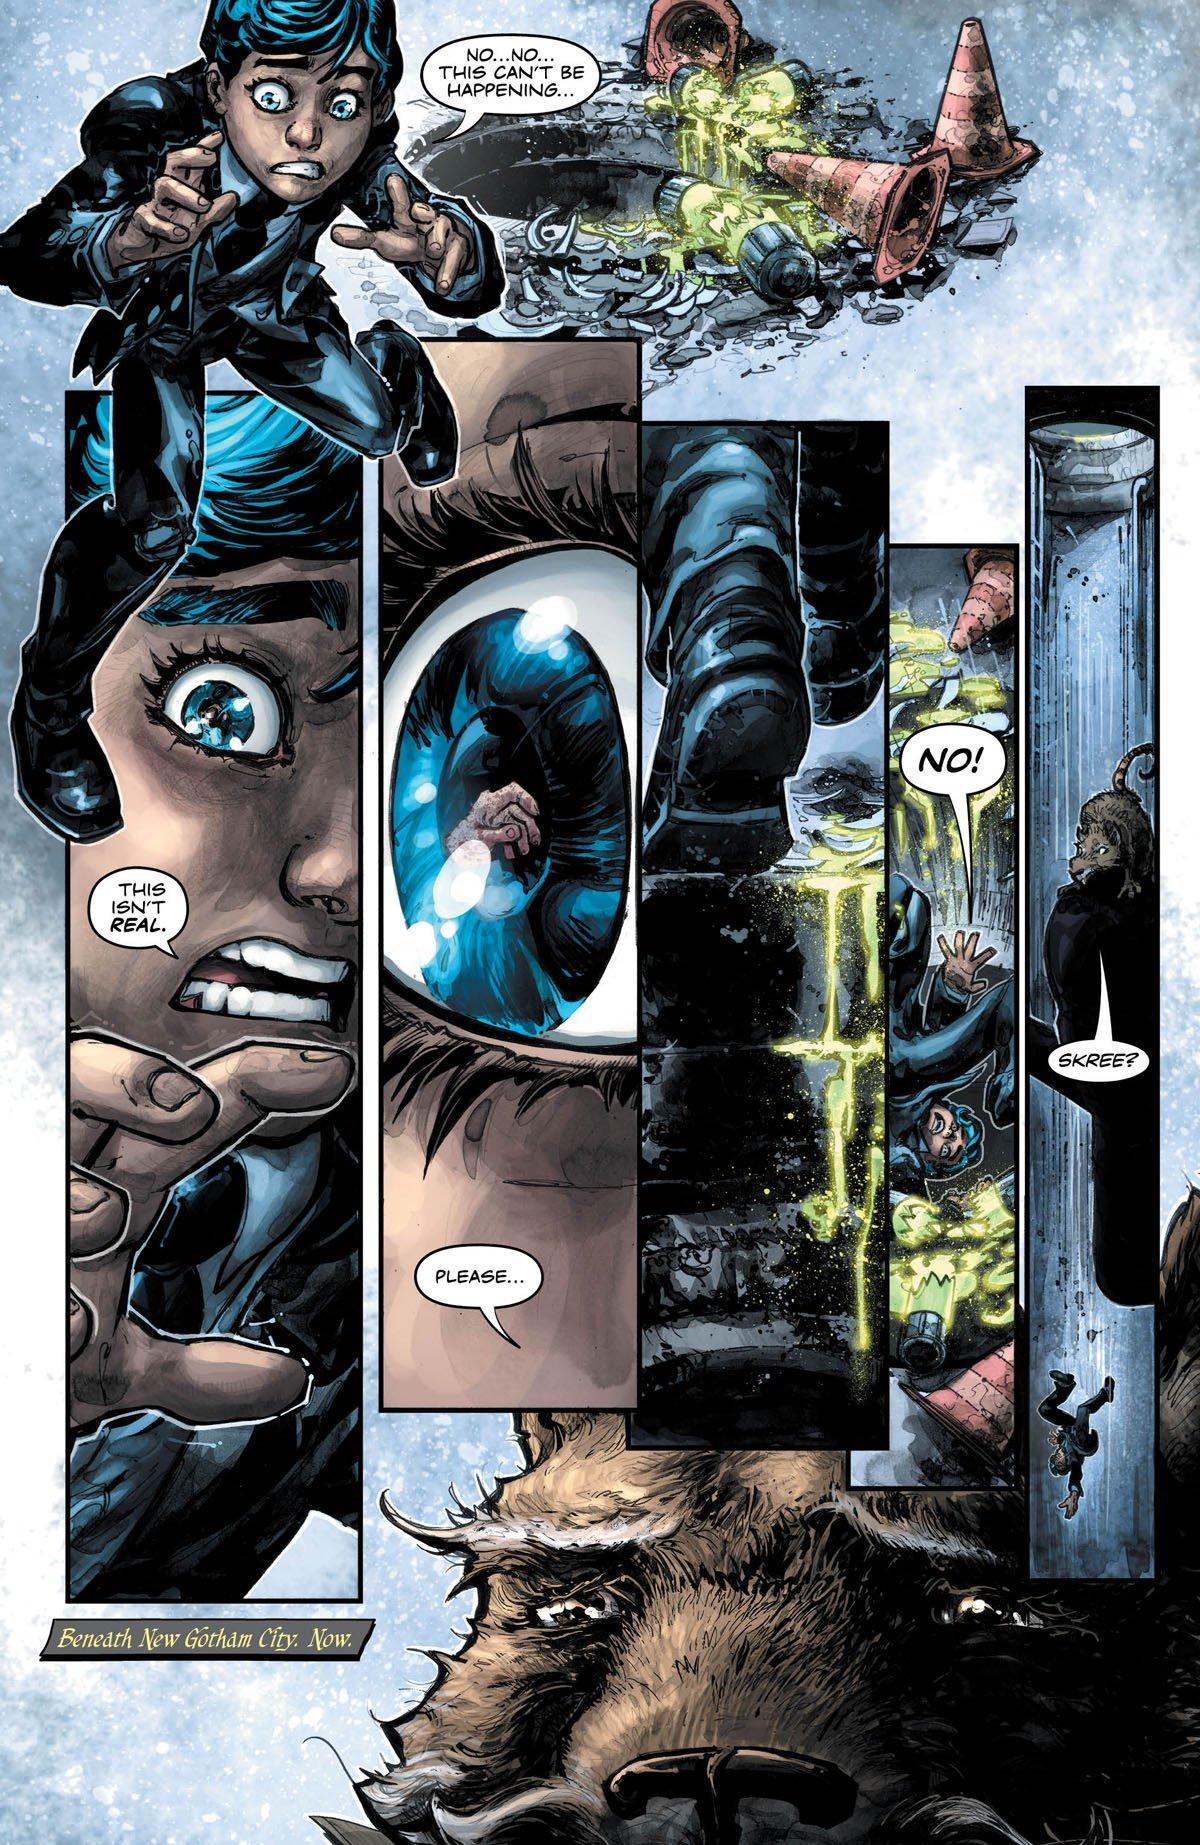 batman-tmnt-iii-issue-3-page-5.jpg